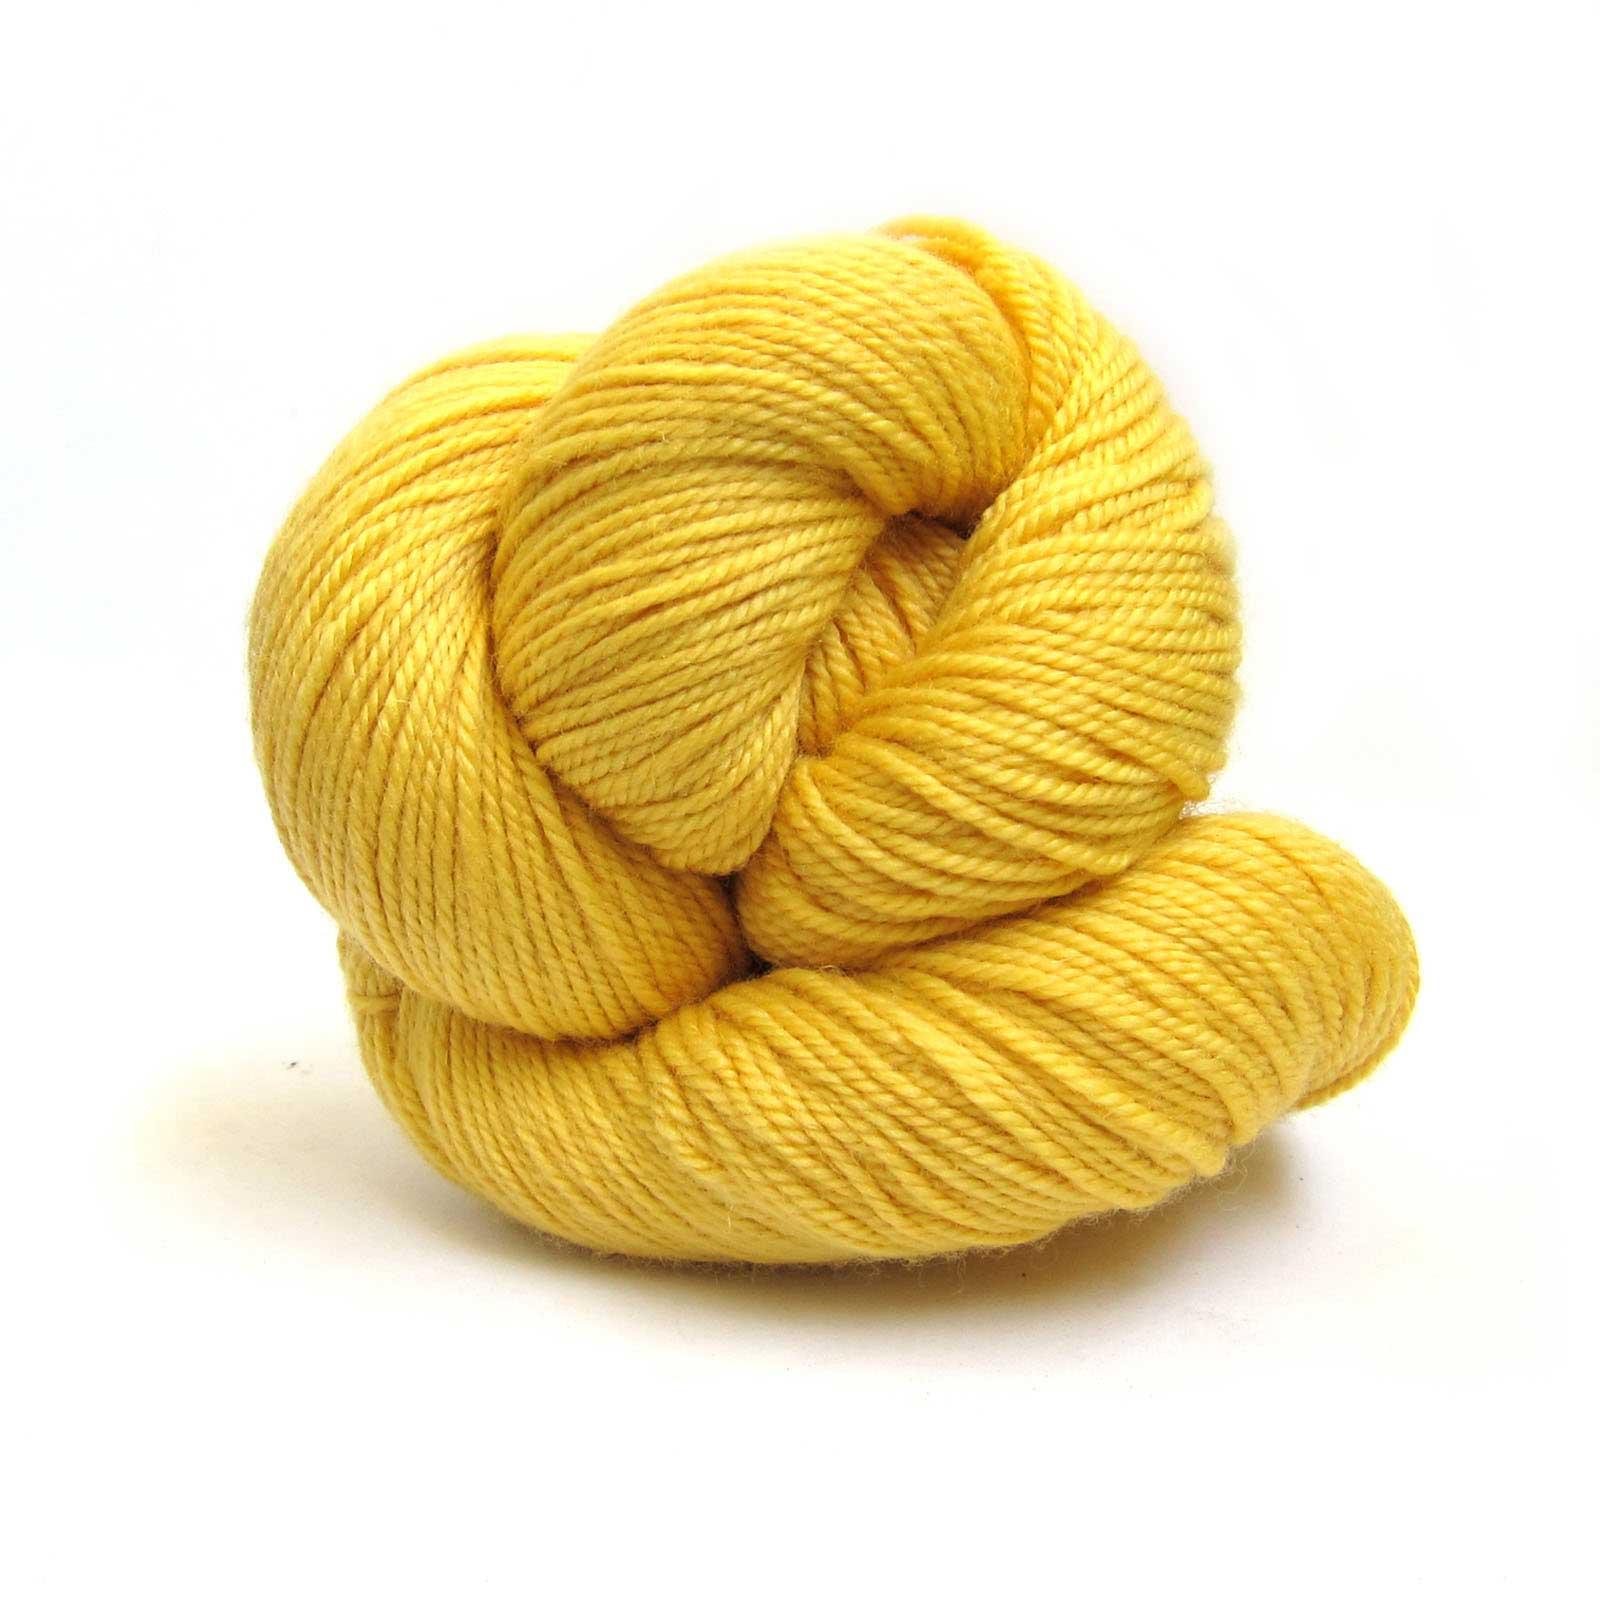 Buttercup Louet Gems 100% Merino Superwash Yarn